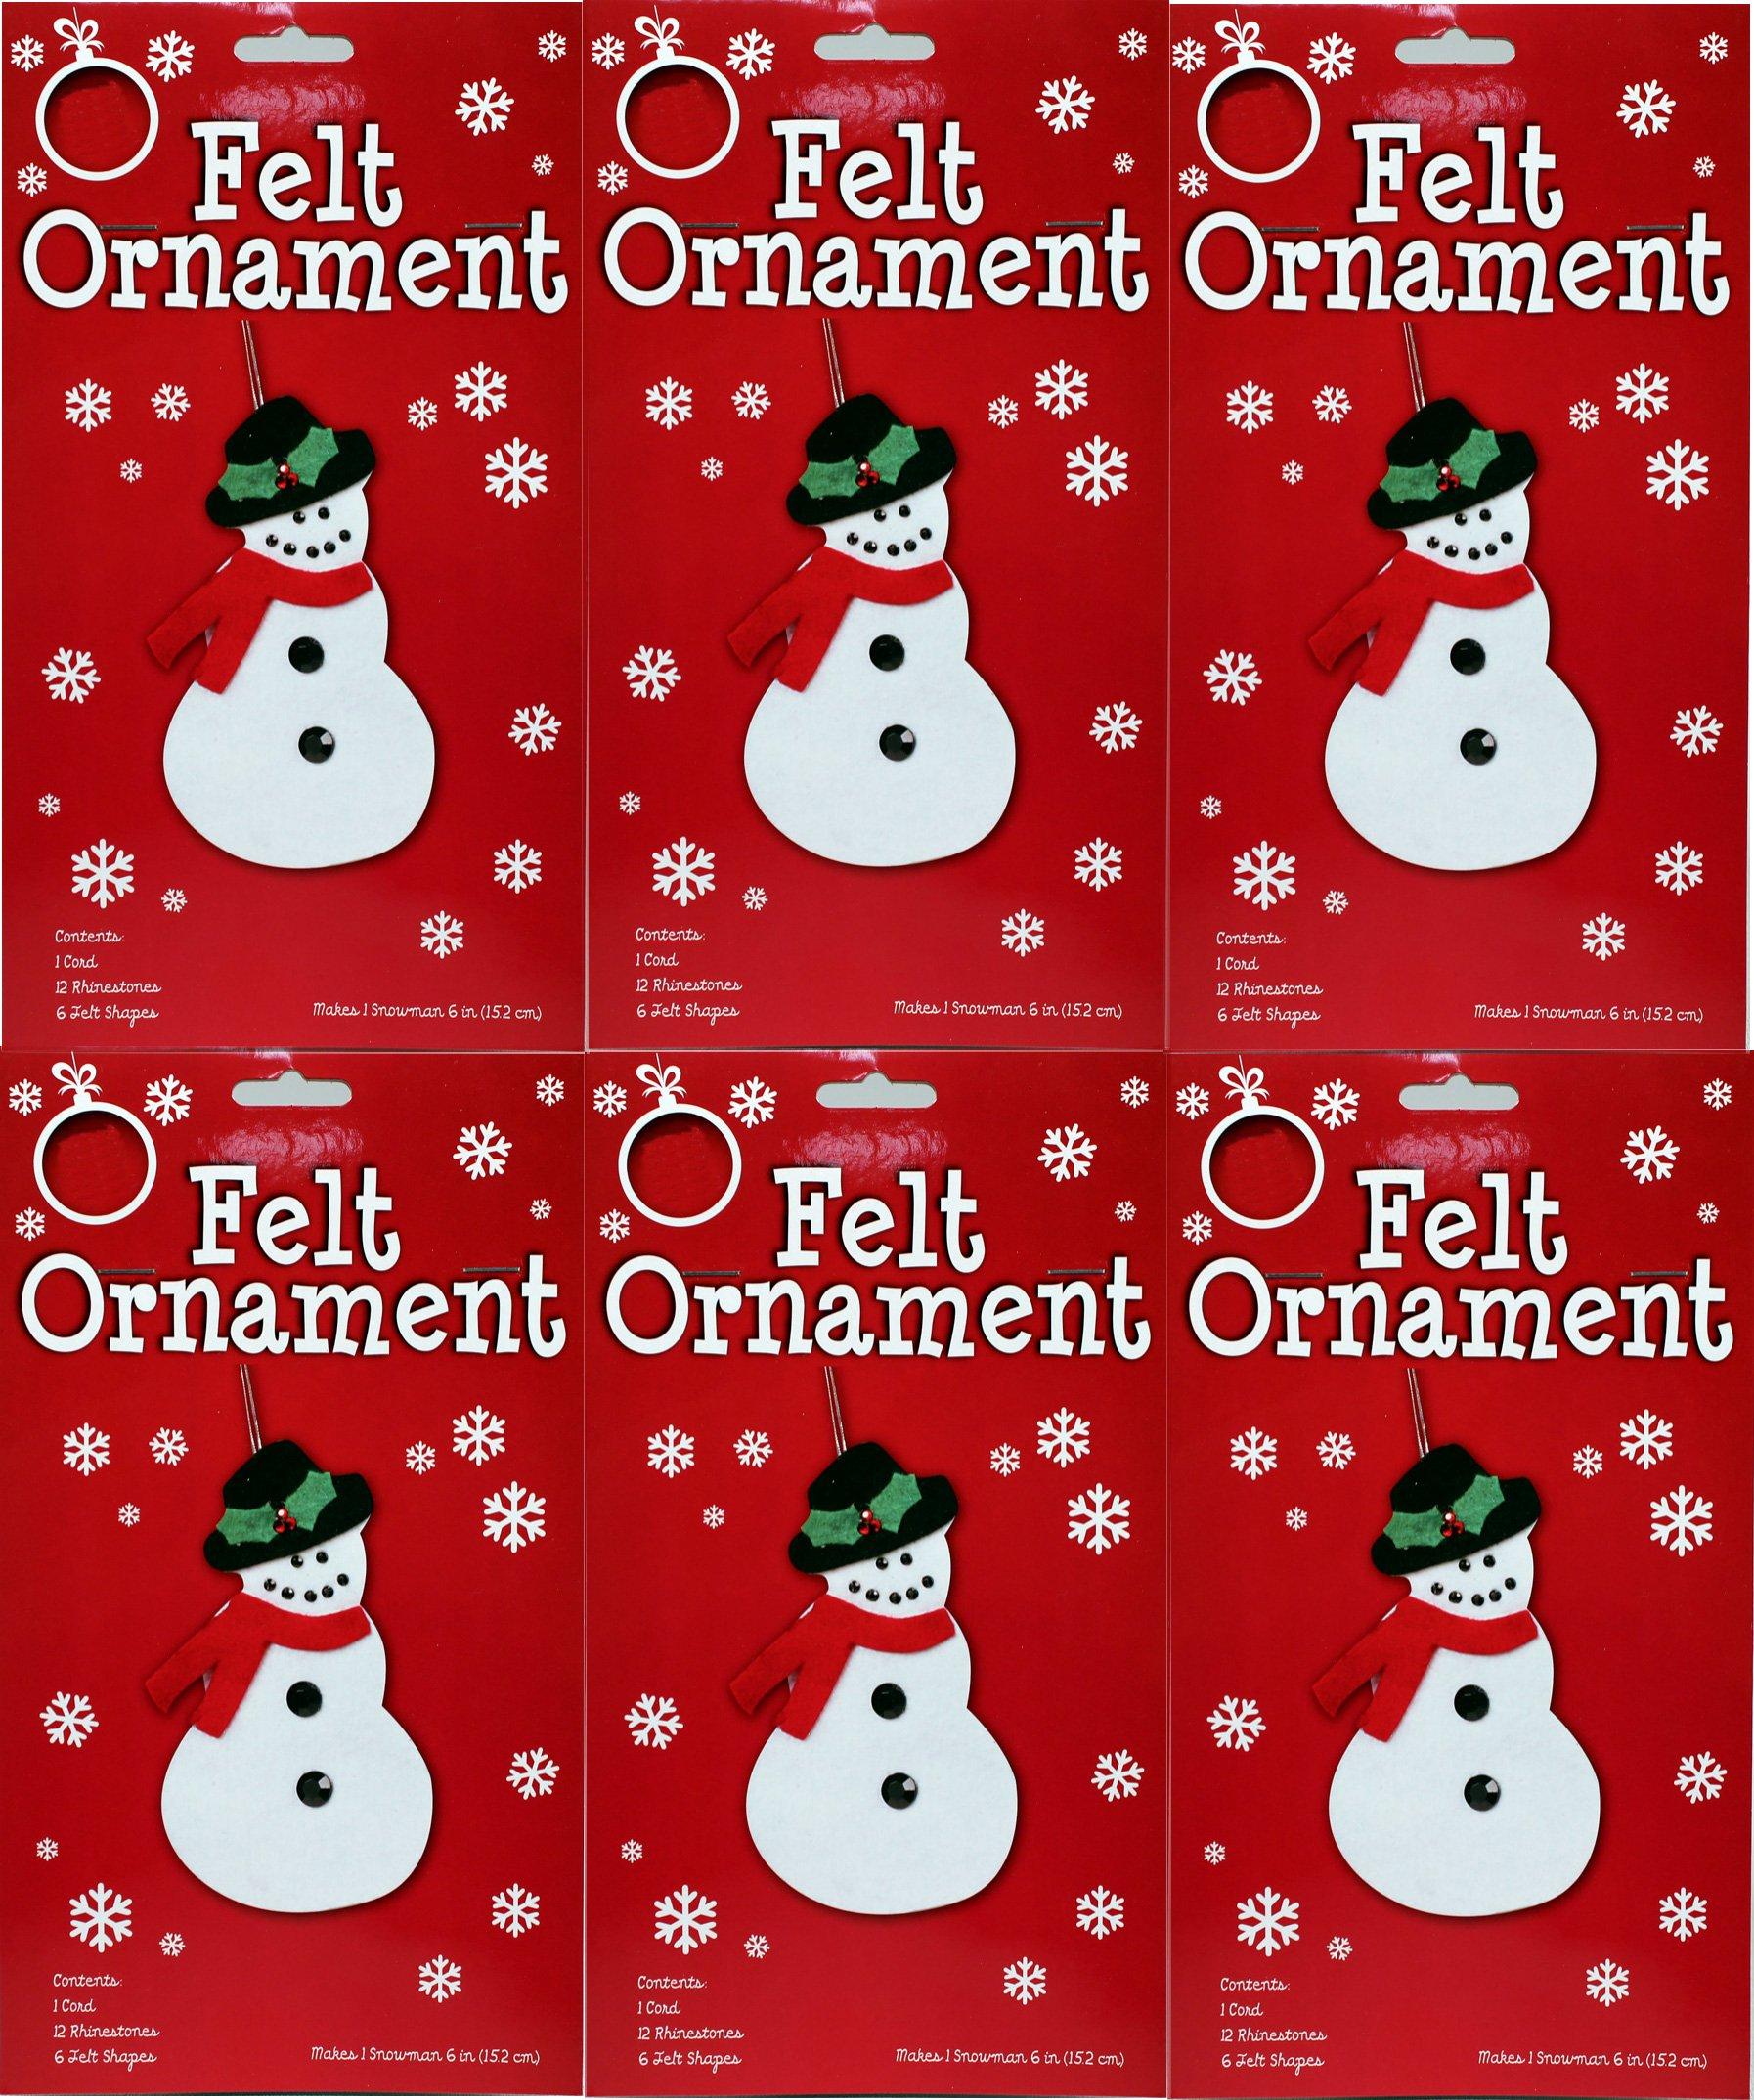 Make Your Own Felt Christmas Ornament Kit, Snowman, Wholesale Pack of 12 Kits